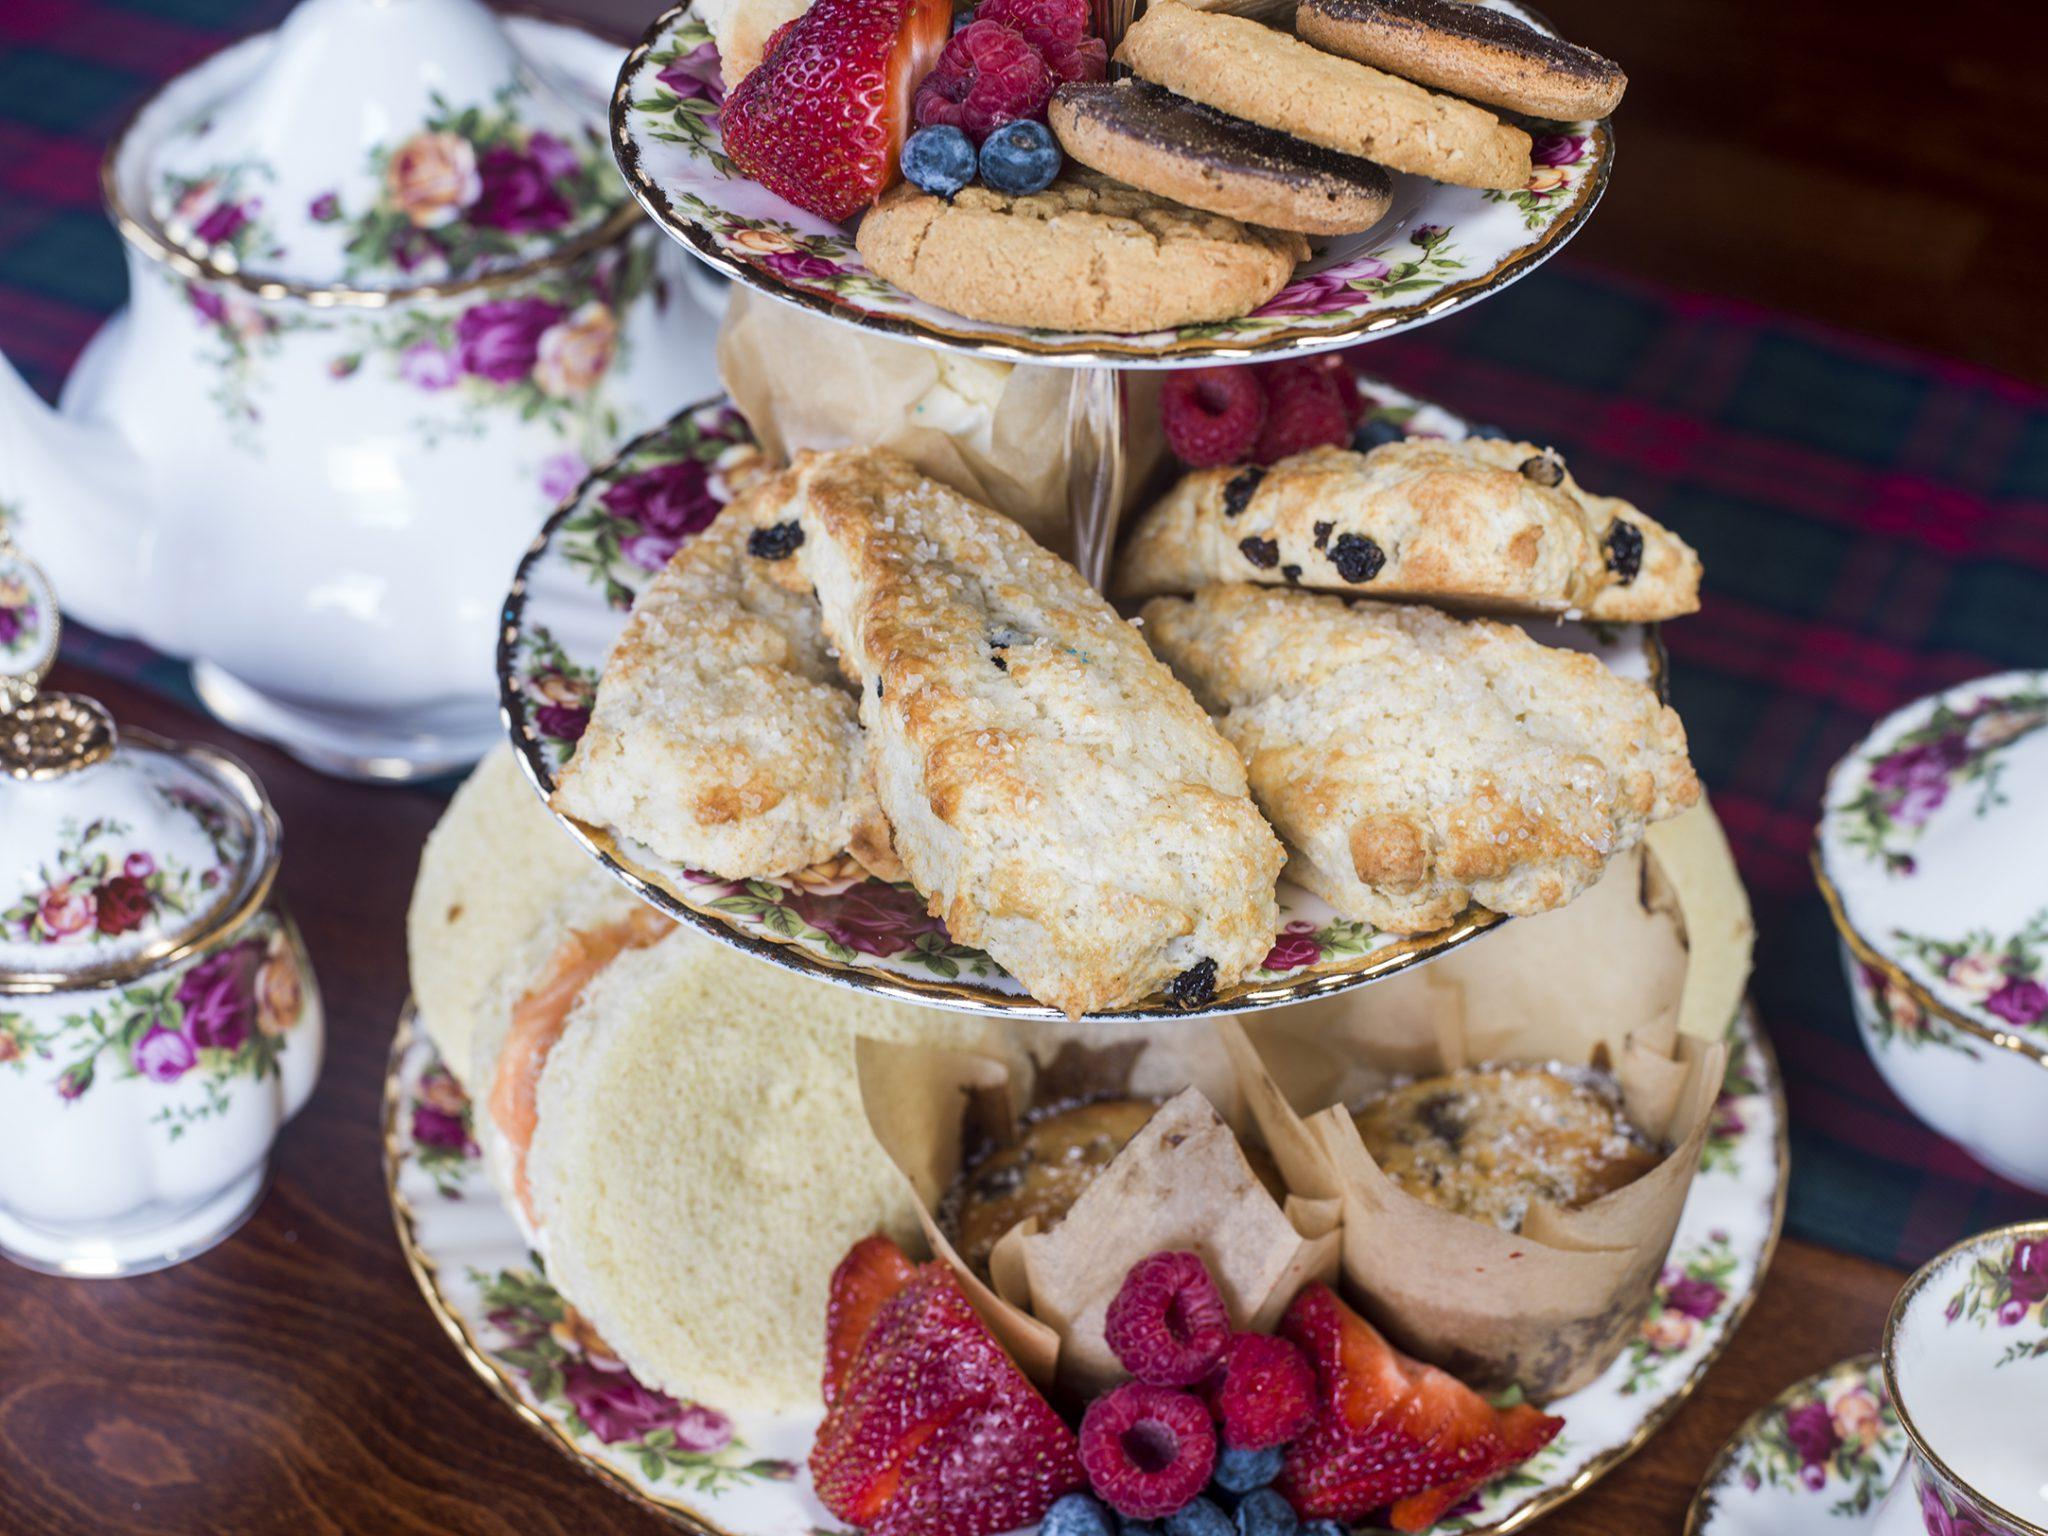 Menu – Scottish Afternoon Tea